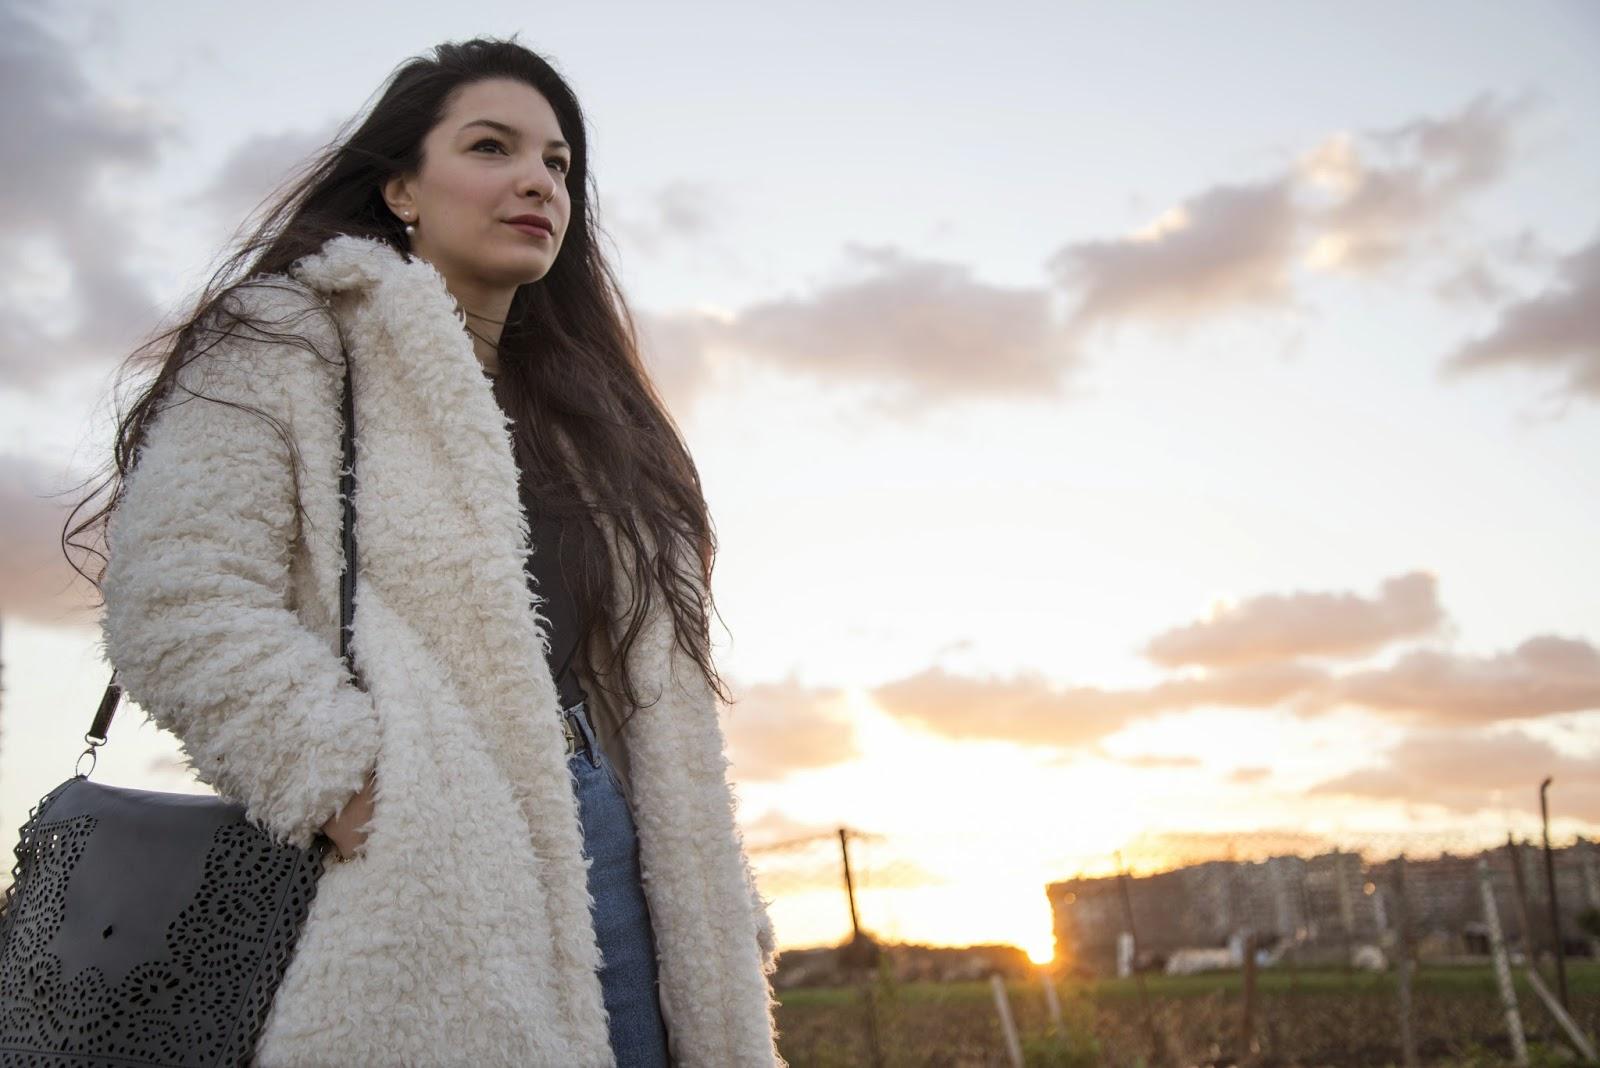 white fur, fur coat, fashion 2015, trends, vintage, stradivarius, fashion blogger, sunset